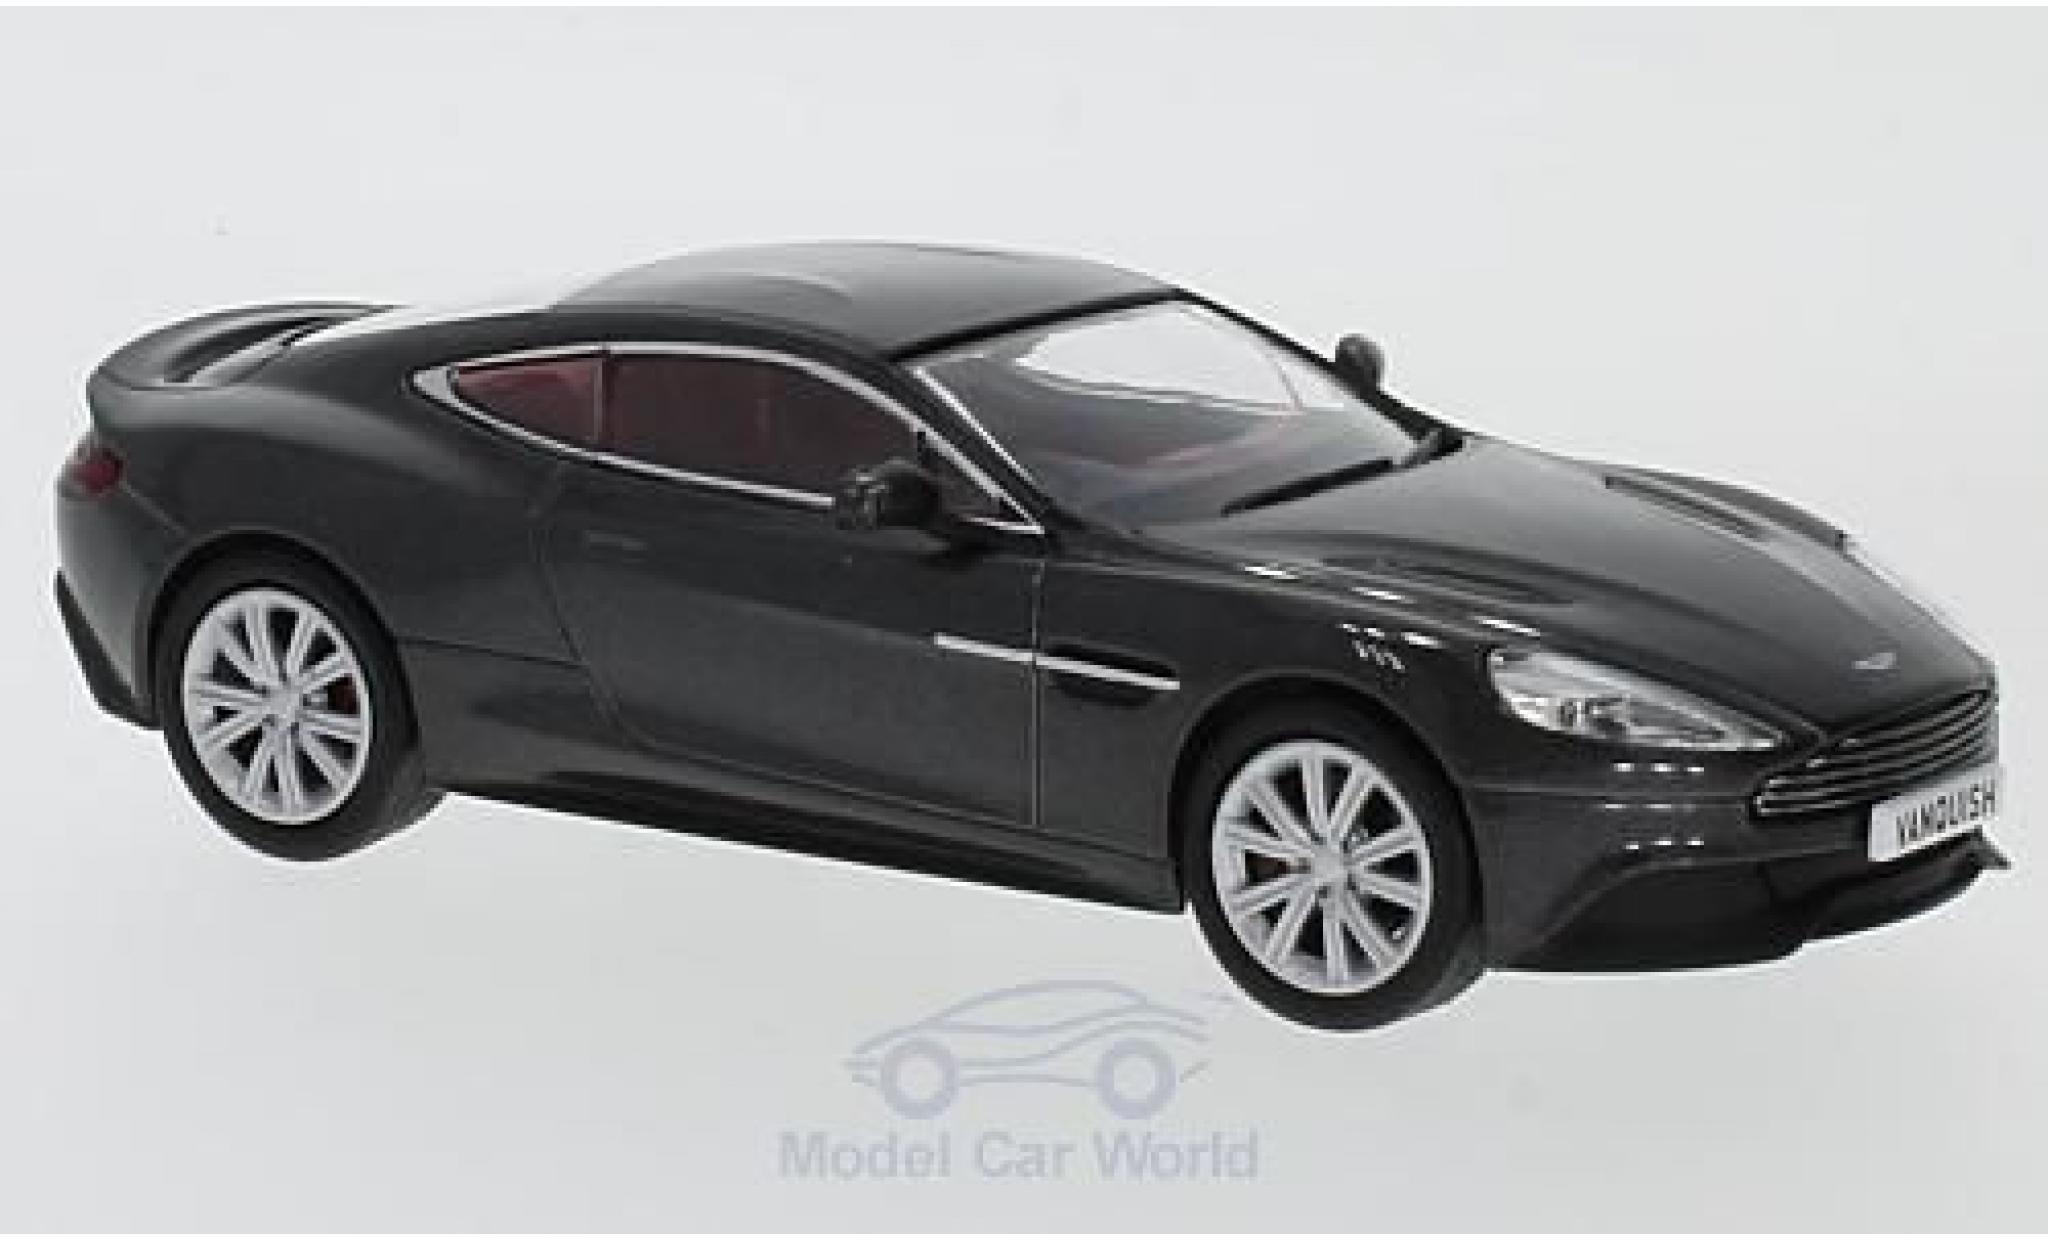 Aston Martin Vanquish 1/43 Oxford Coupe metallise grise RHD